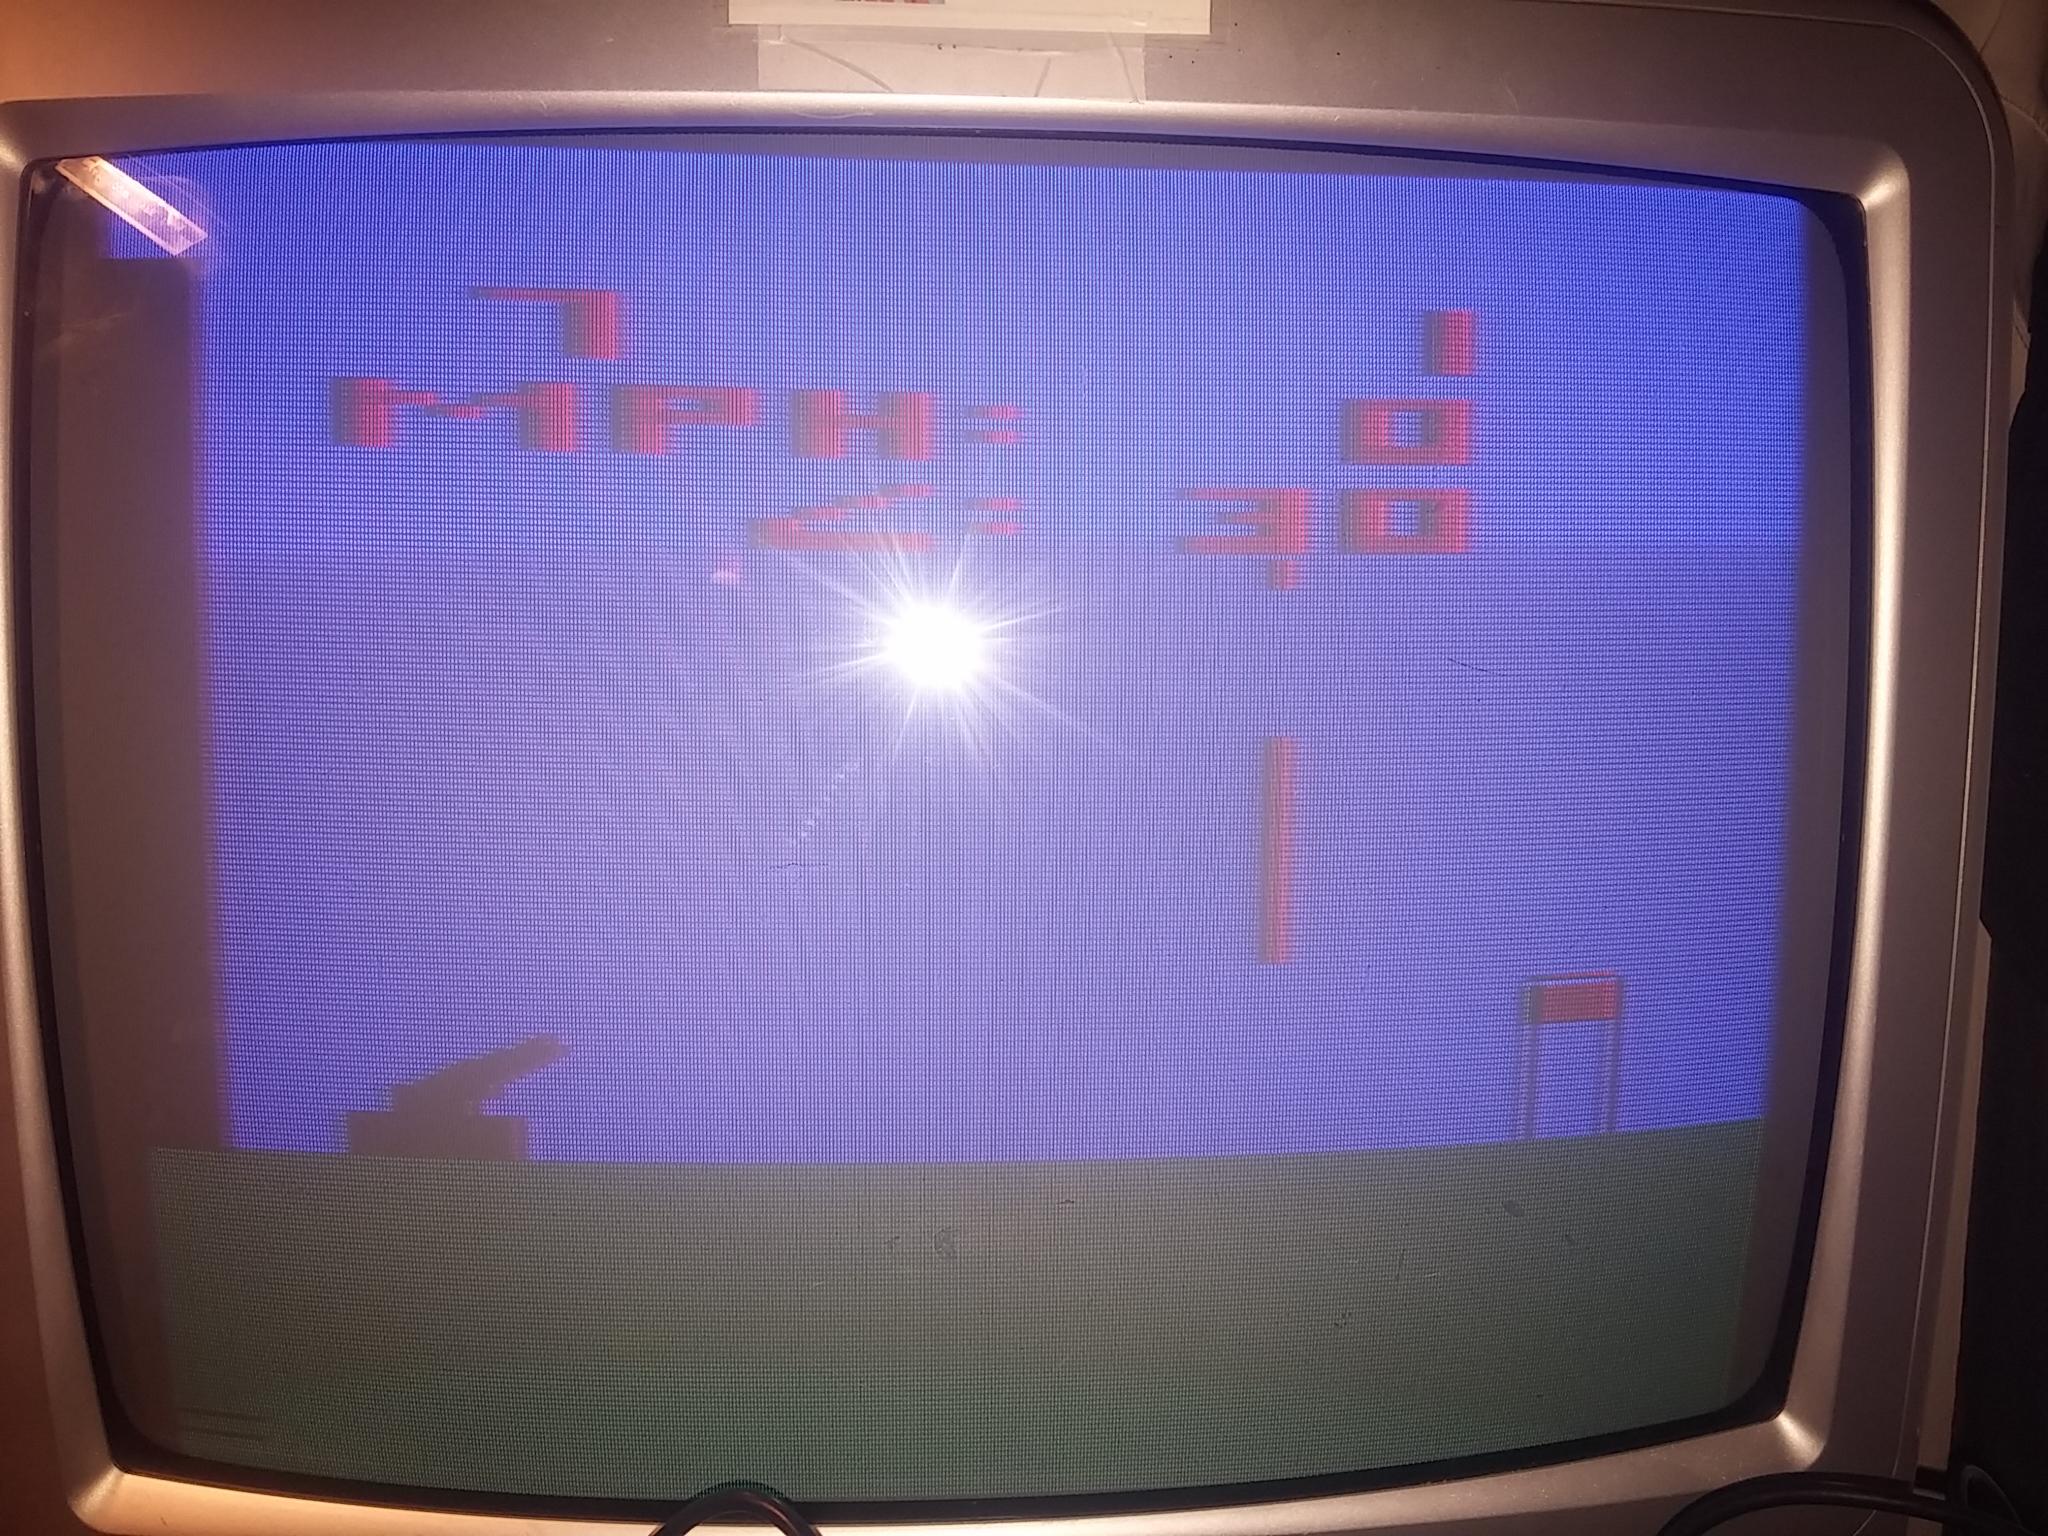 Pitfall75: Human Cannonball [Game 7] (Atari 2600 Novice/B) 3 points on 2018-02-12 20:48:35